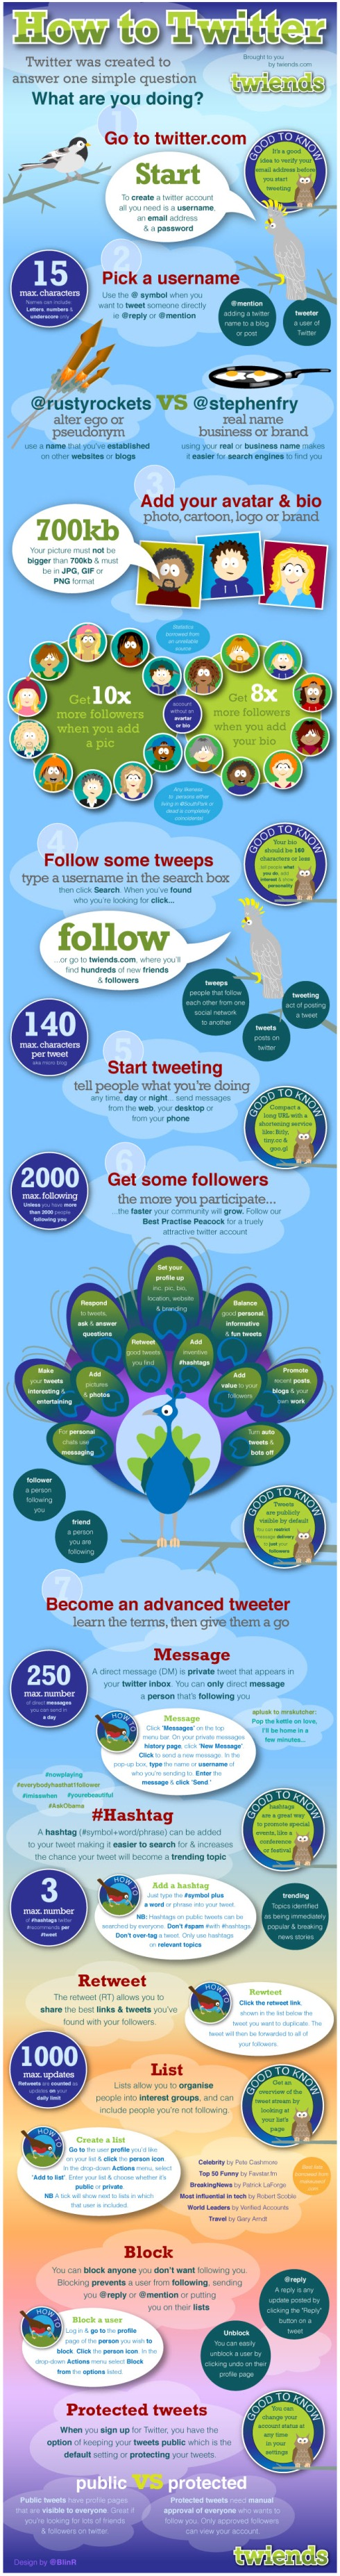 ¿Sabes usar twitter?